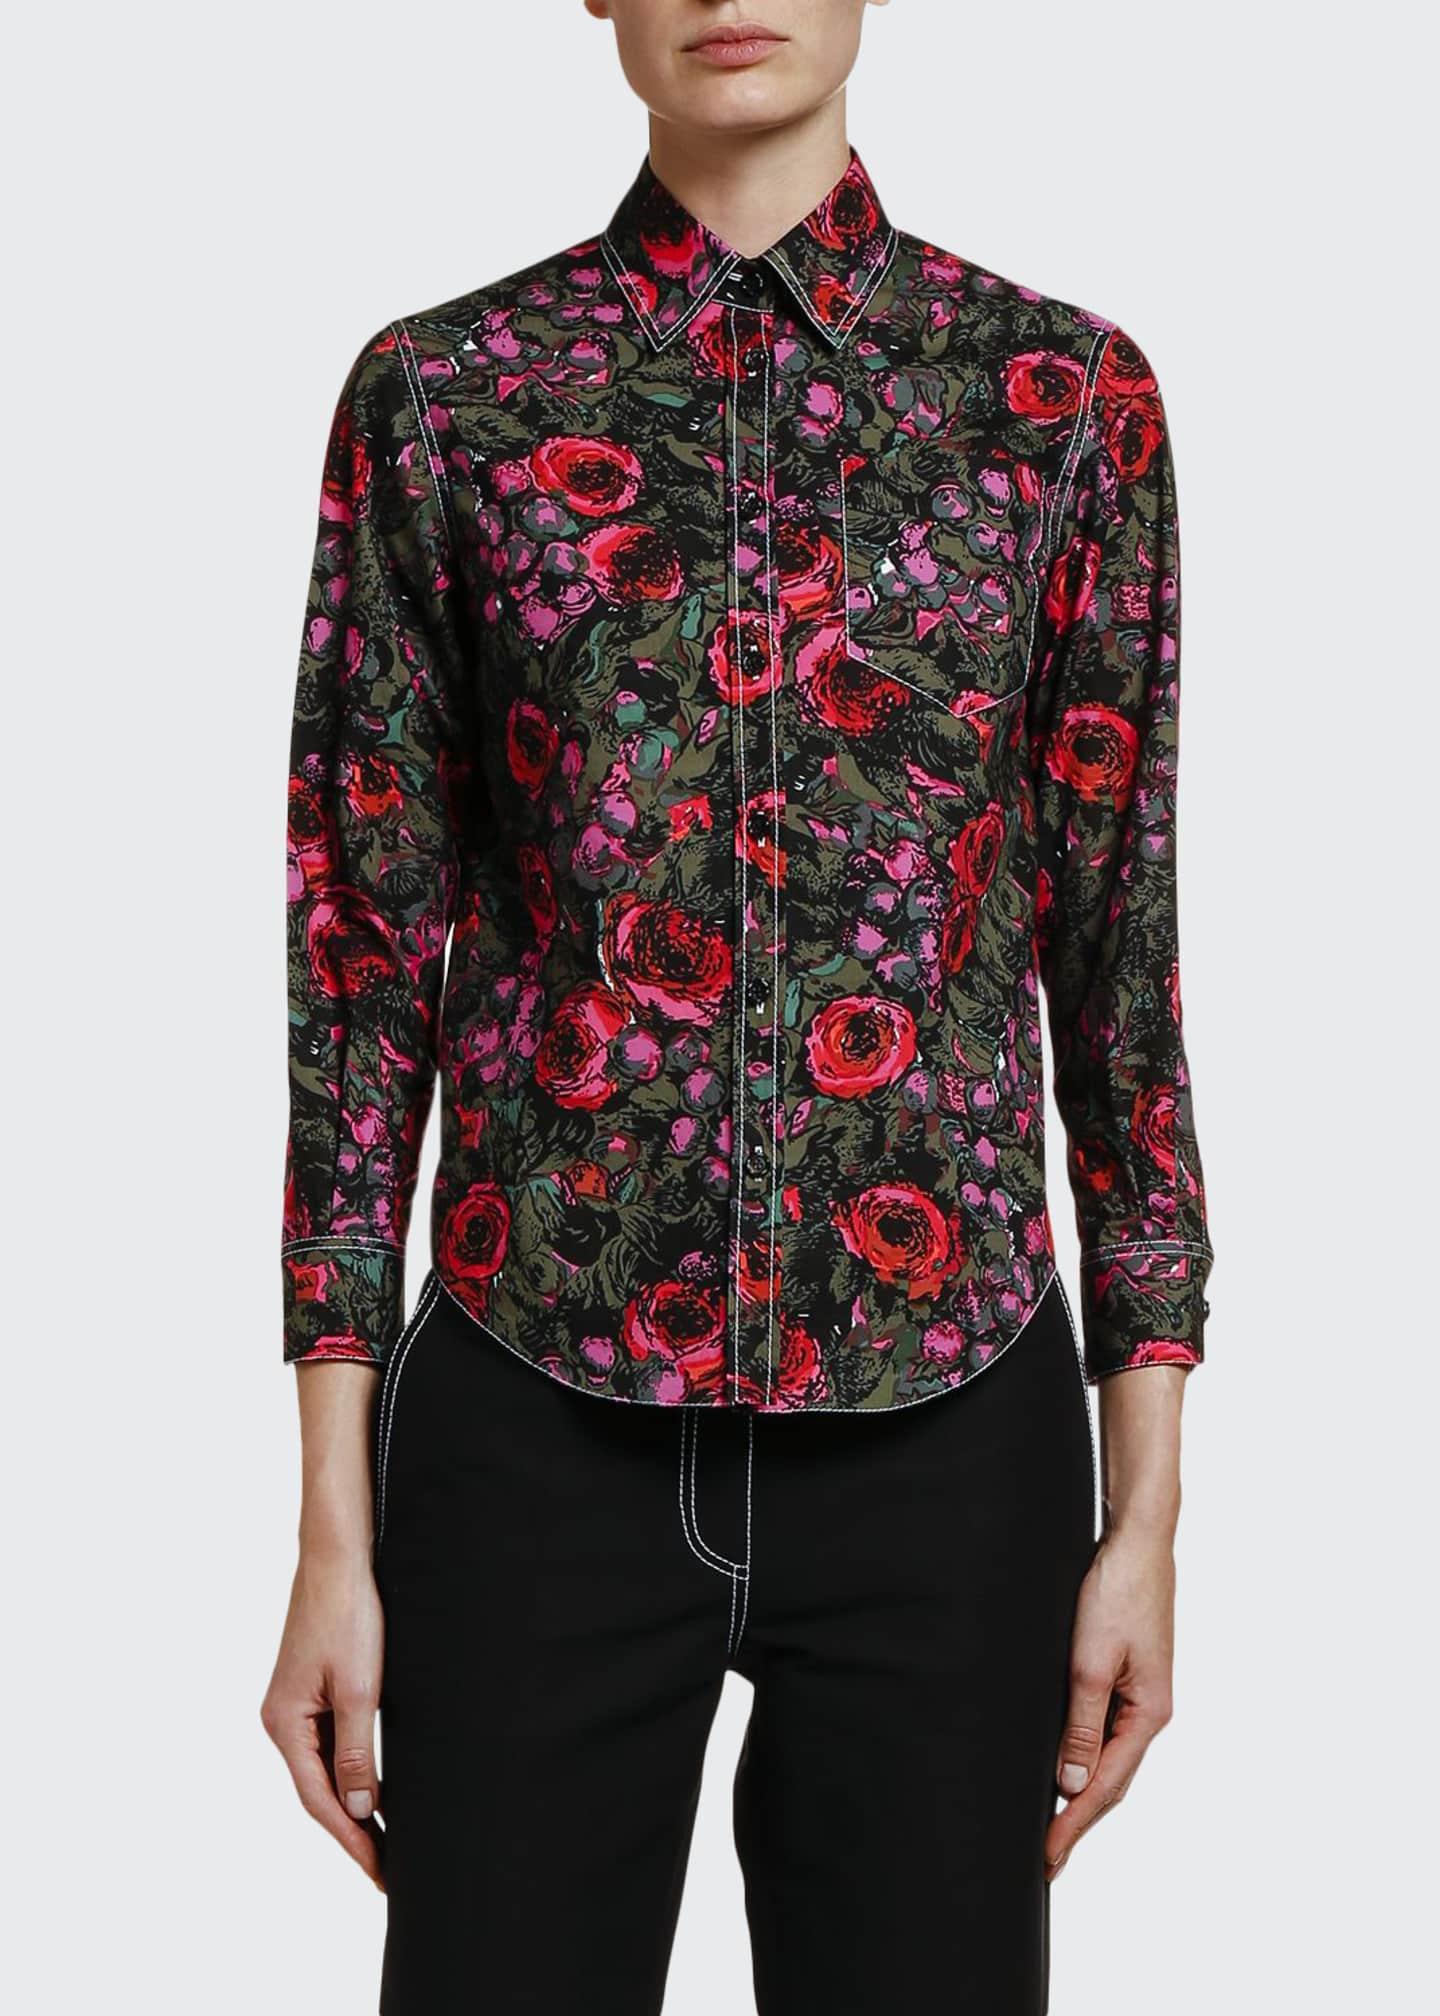 Marni Floral-Print Cotton Poplin Shirt